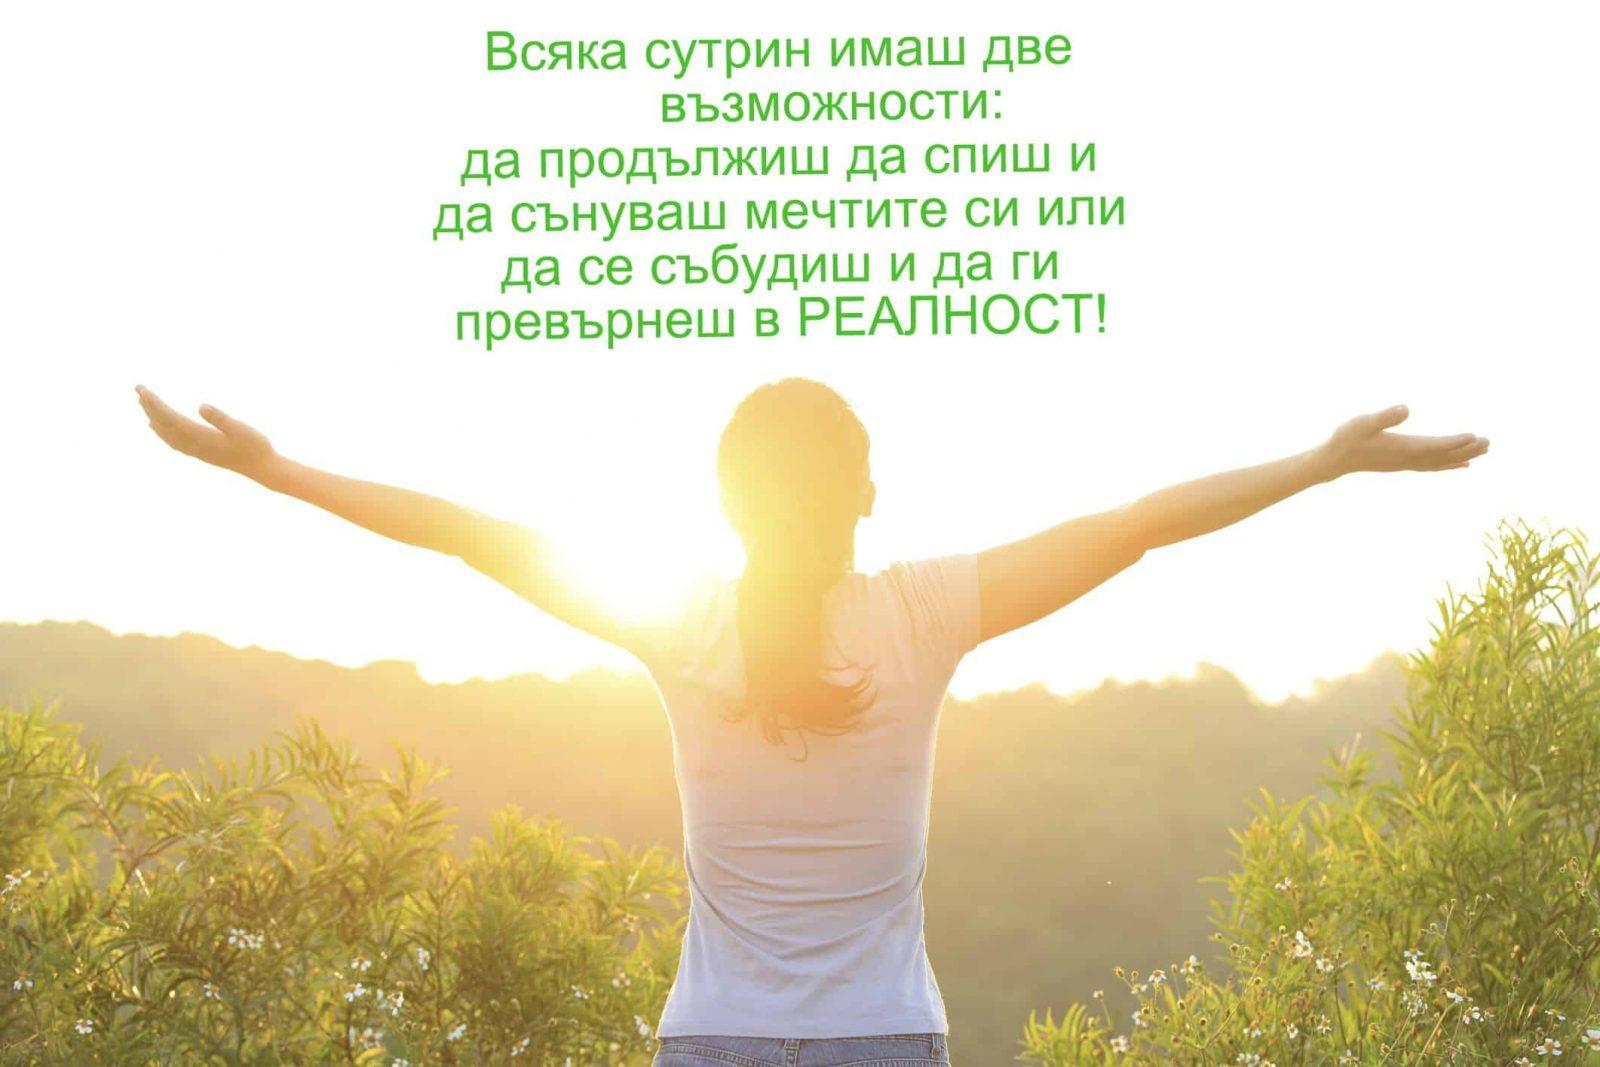 cenni-misli-za-vsqka-sytrin-evolife.bg-min.jpg